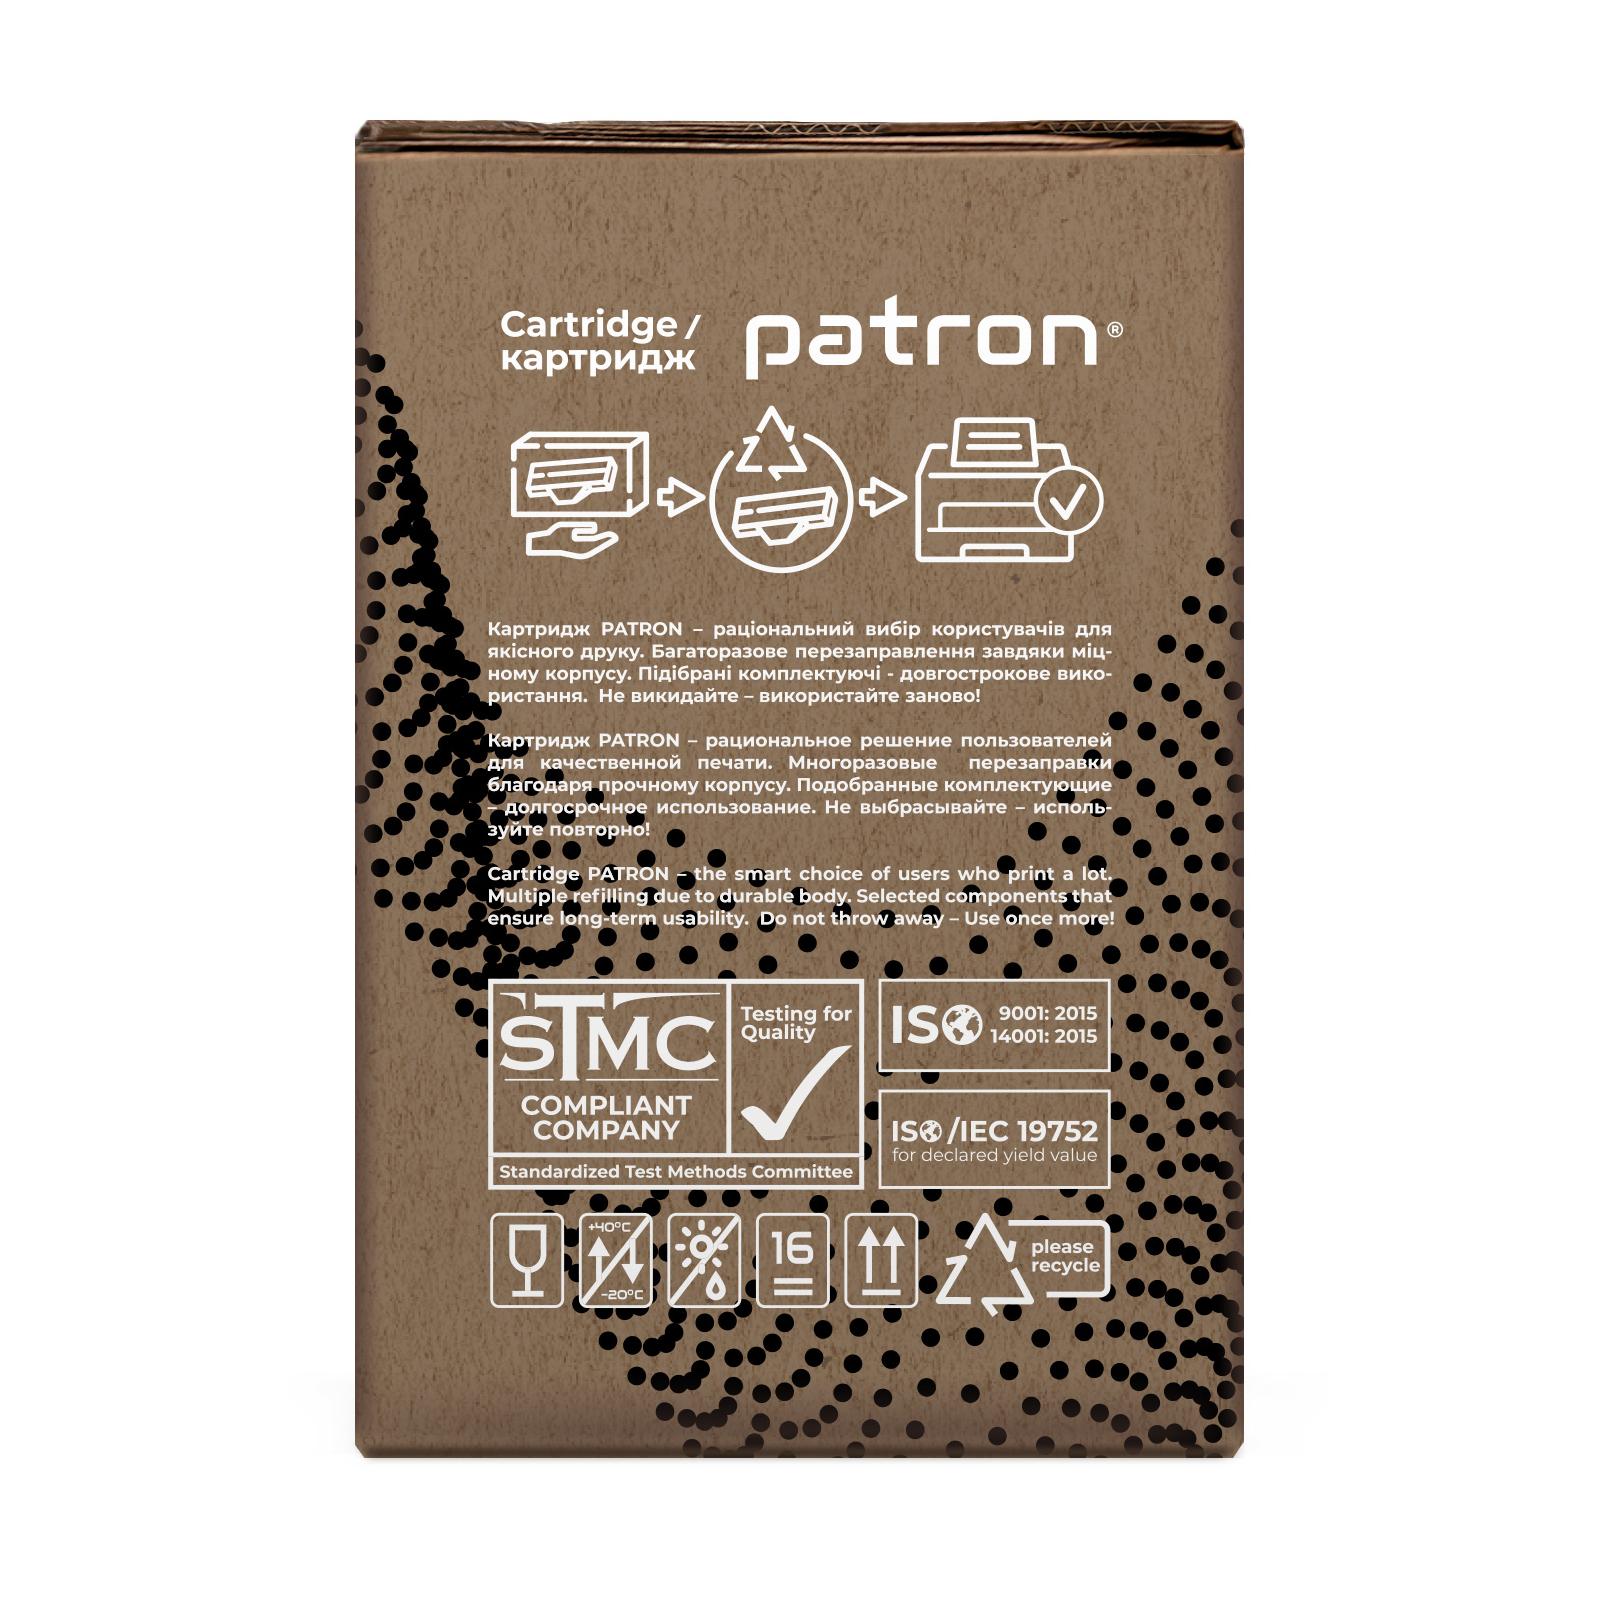 Картридж Patron SAMSUNG MLT-D109S GREEN Label (PN-D109GL) изображение 4